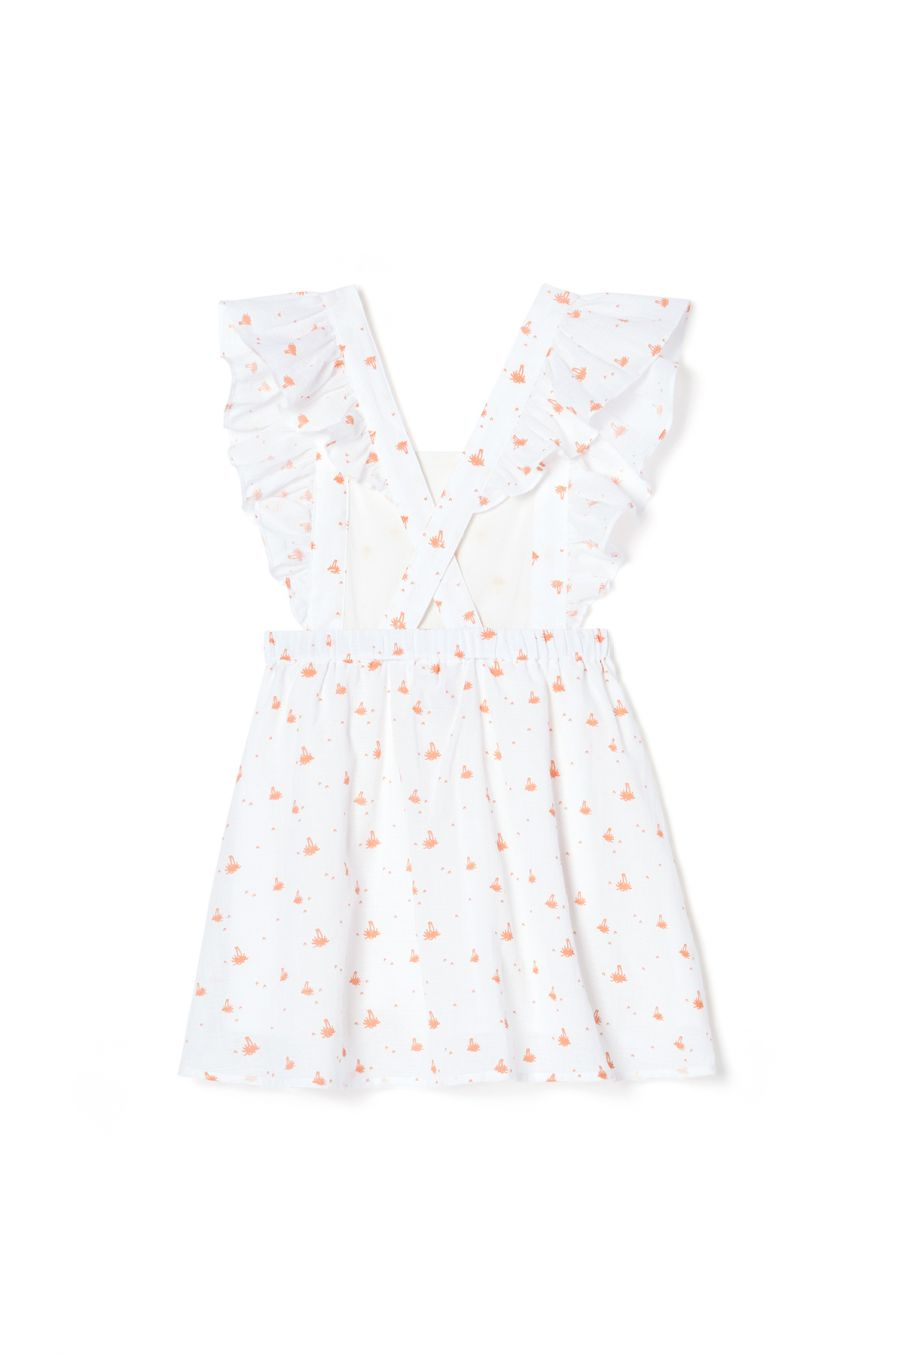 boheme chic vintage robe fille varadero hawai fabric